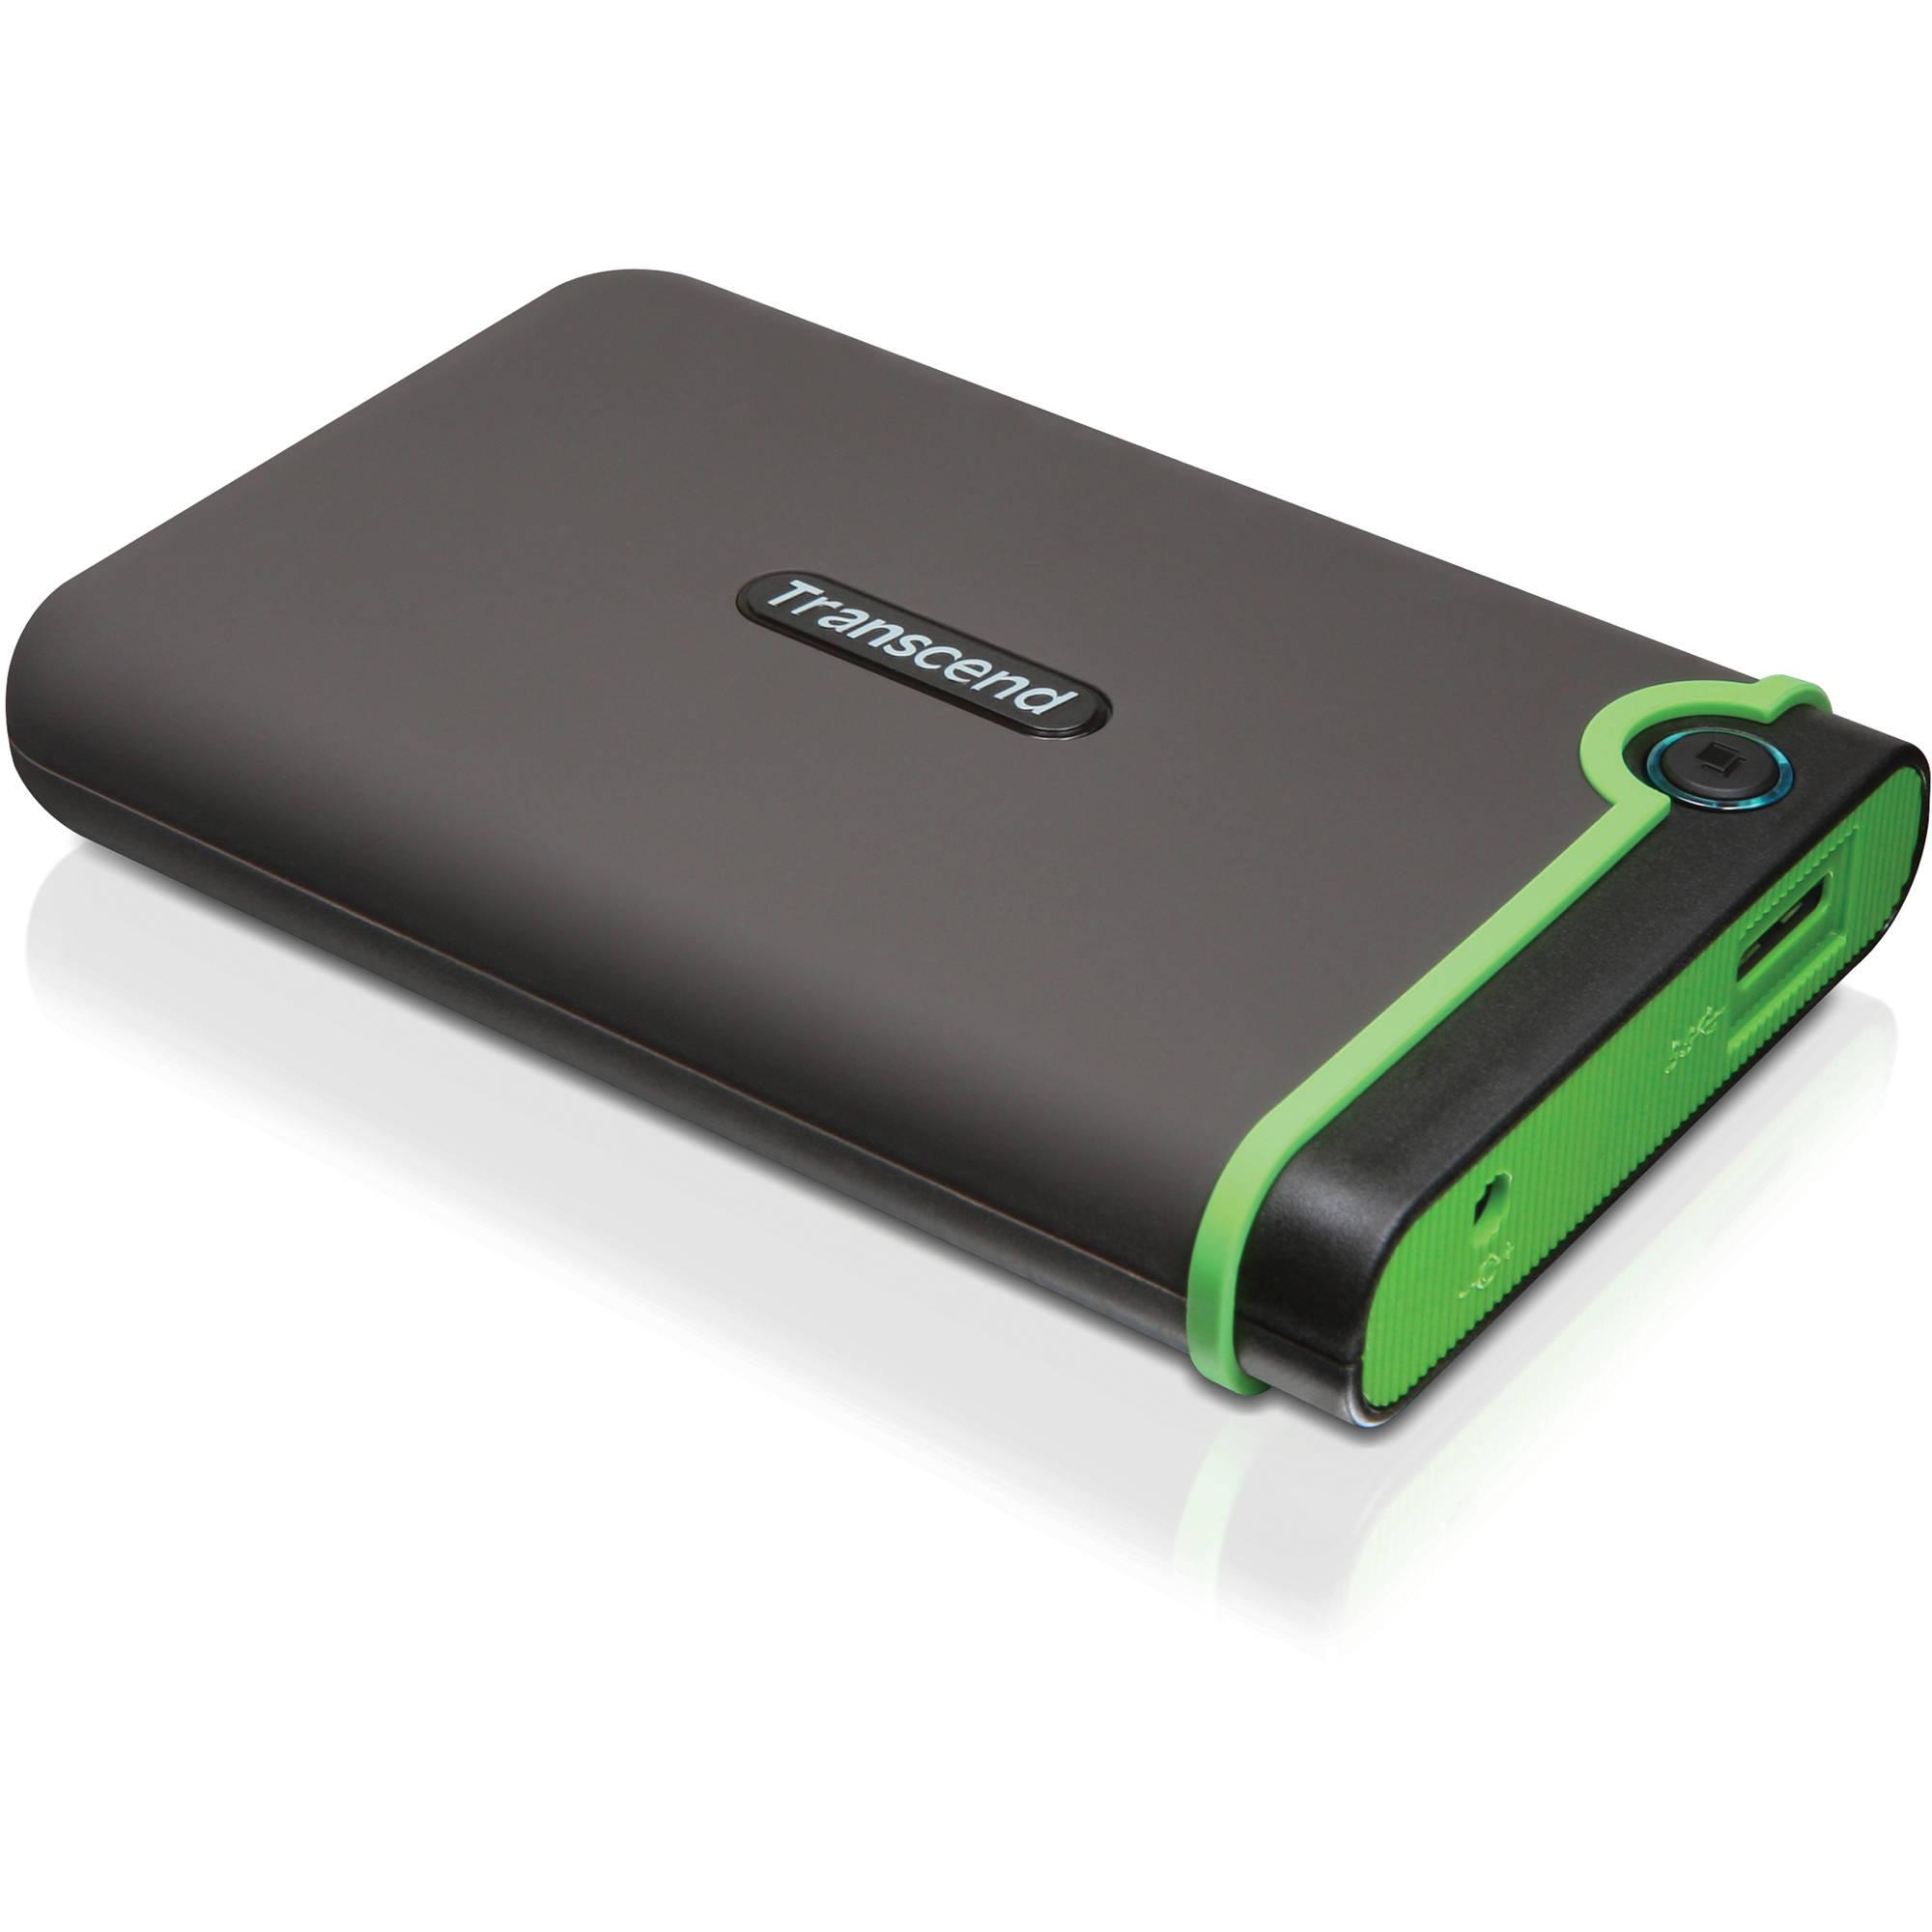 Buy Transcend StoreJet 25M3 USB 3.0 1TB grey from £48.08